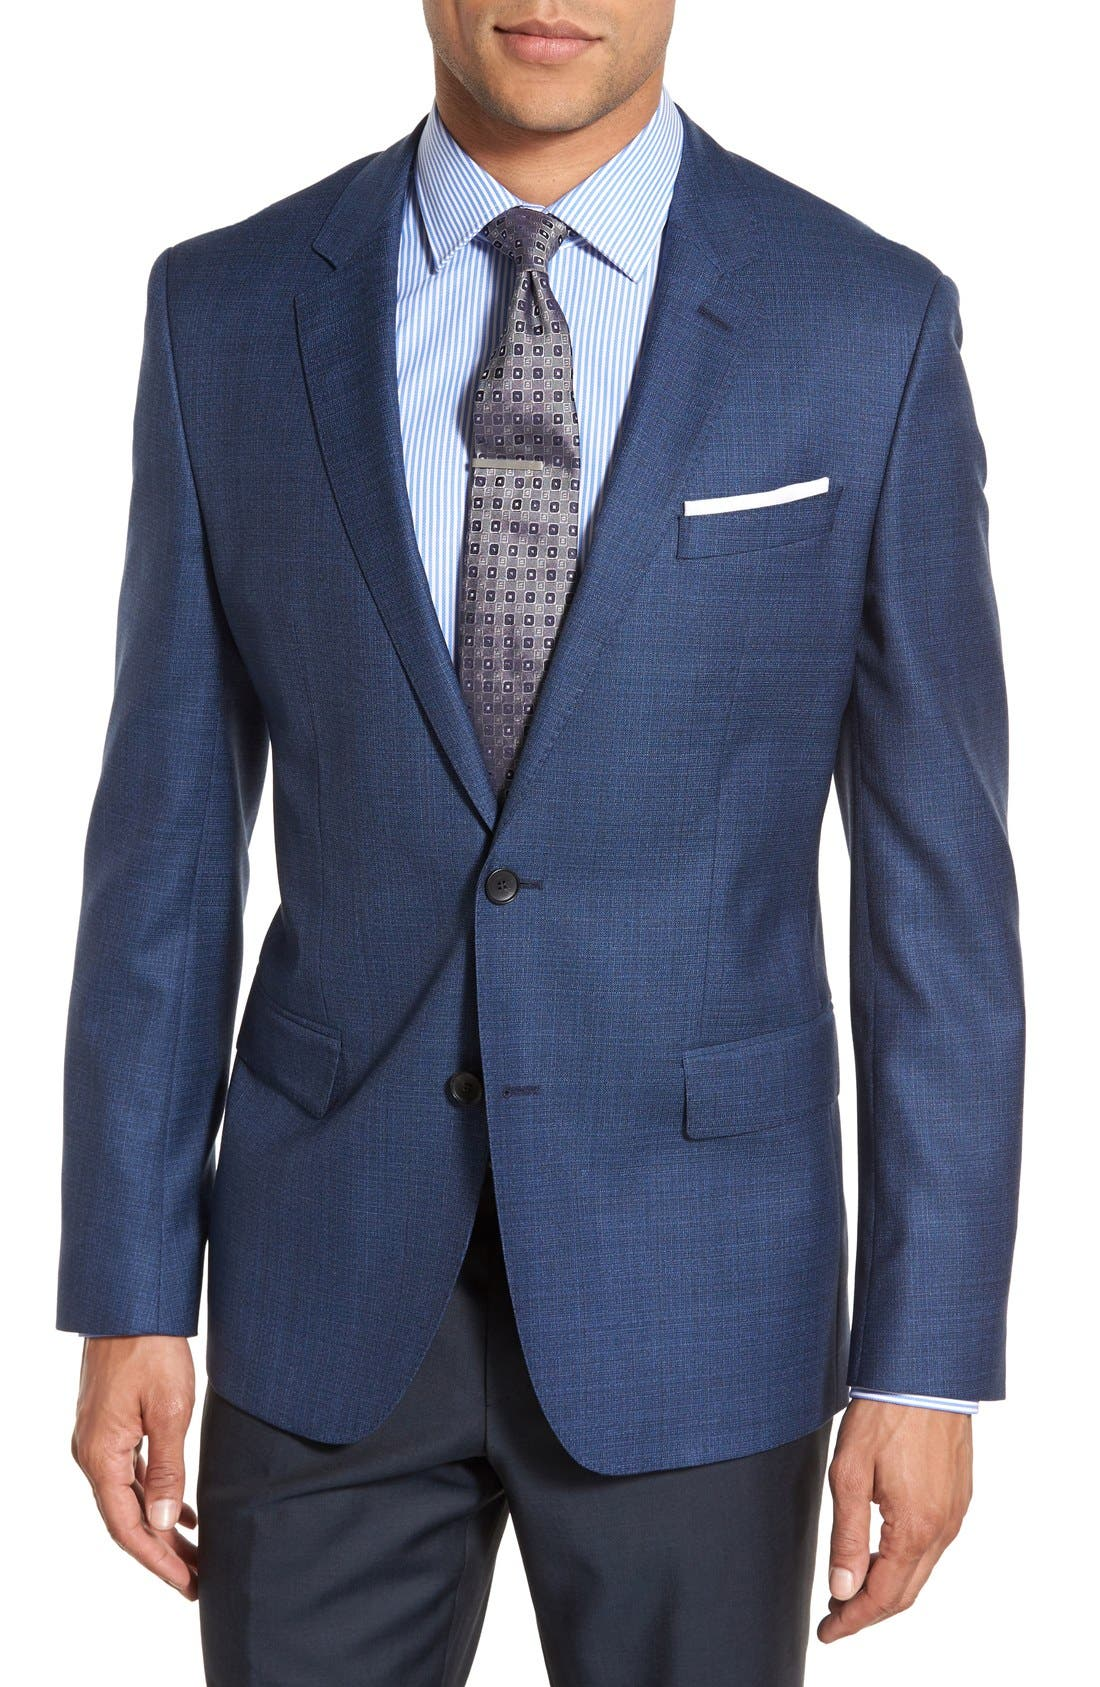 ZZDNUHUGO BOSS BOSS 'Jeen' Trim Fit Wool Blazer, Main, color, 420